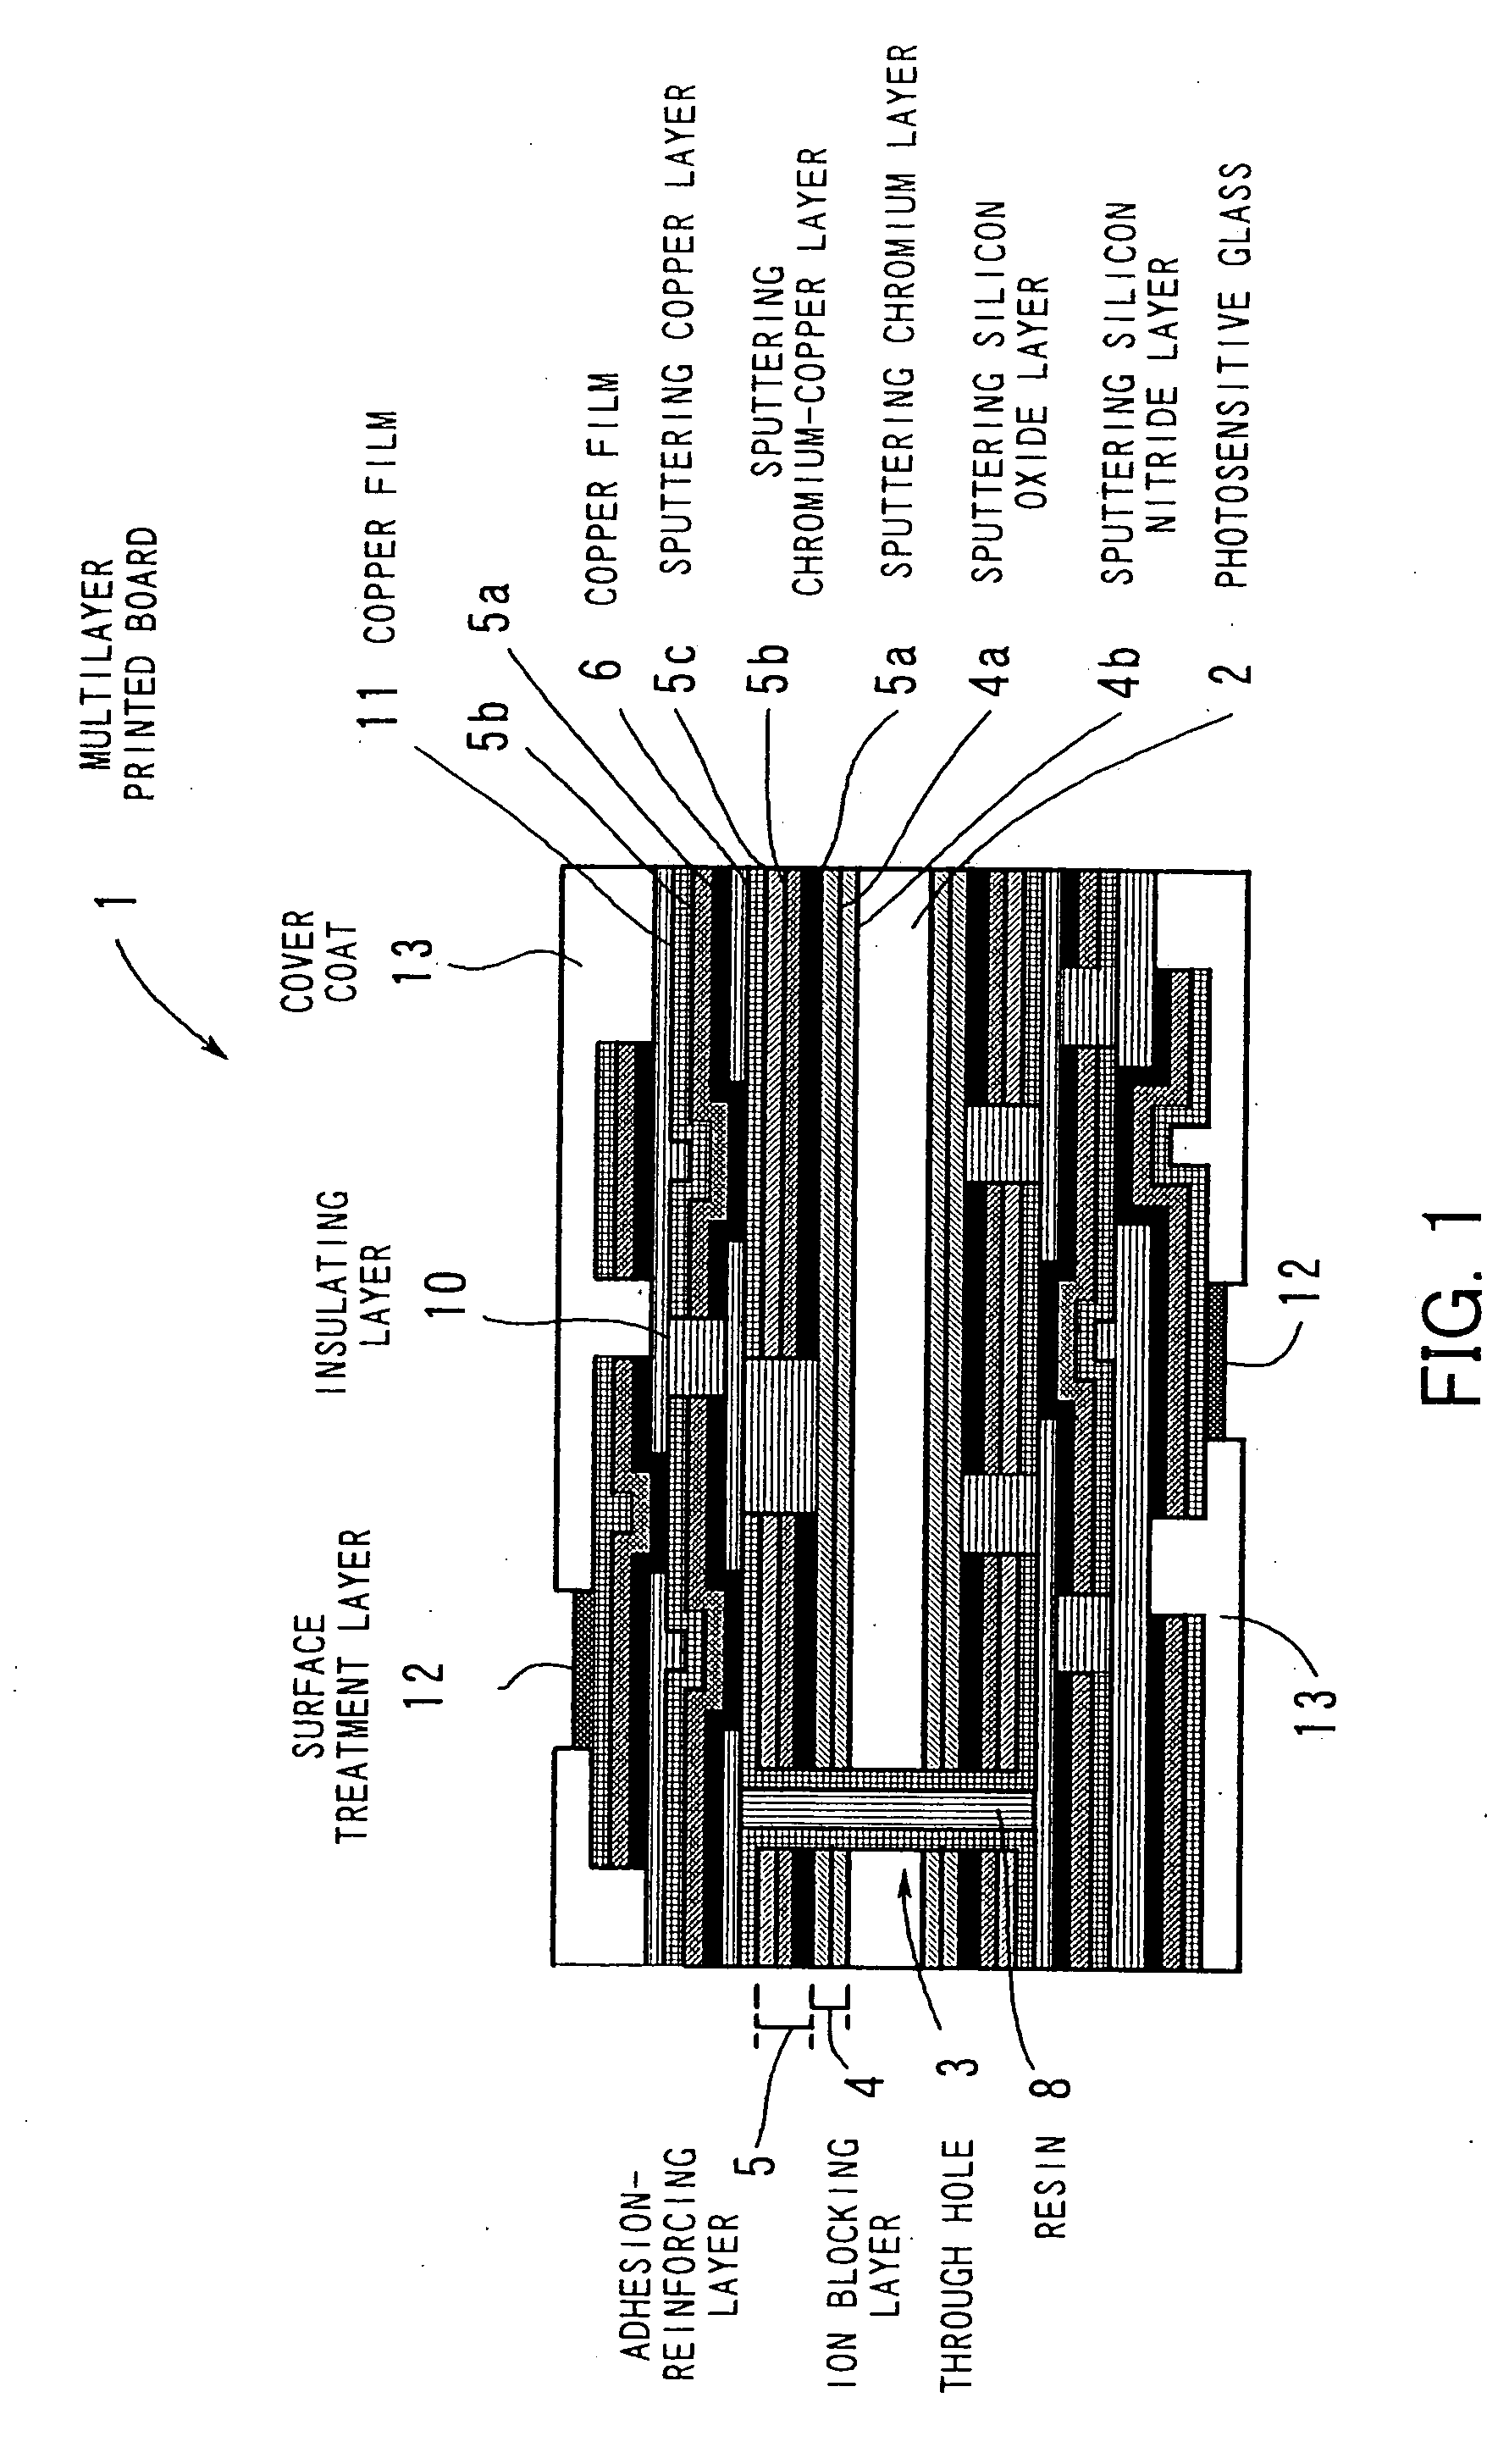 interior wall surface wiring